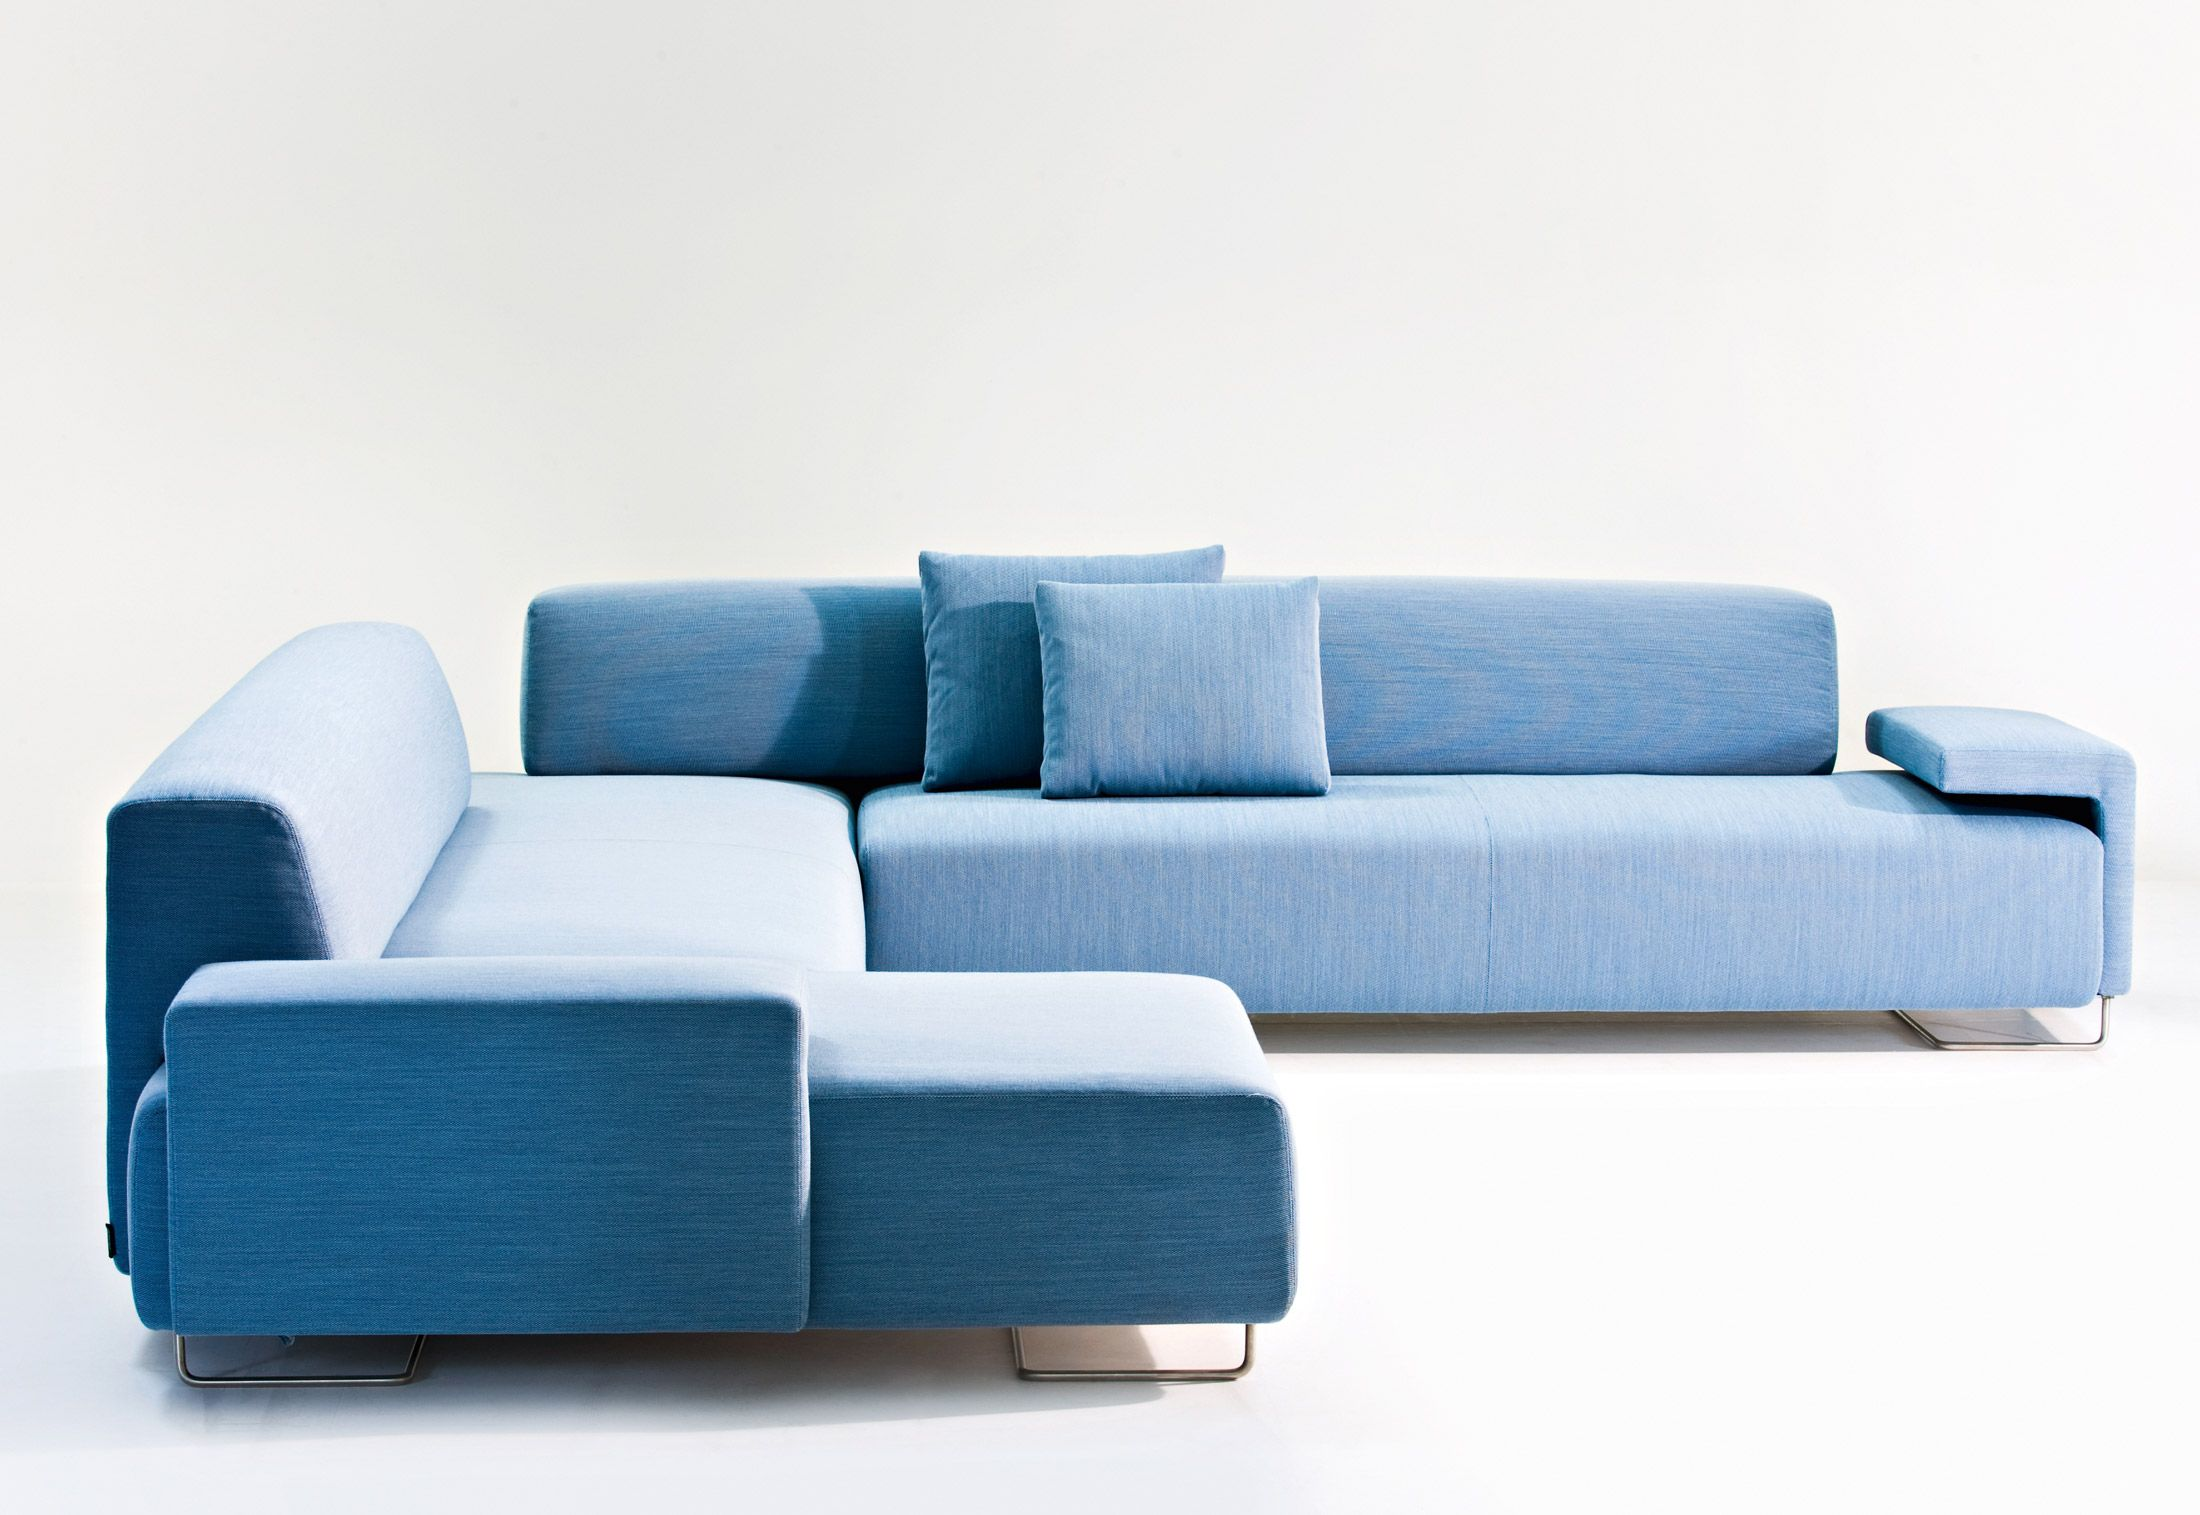 Patricia urquiola moroso lowland sofa modulares for Sillones modulares